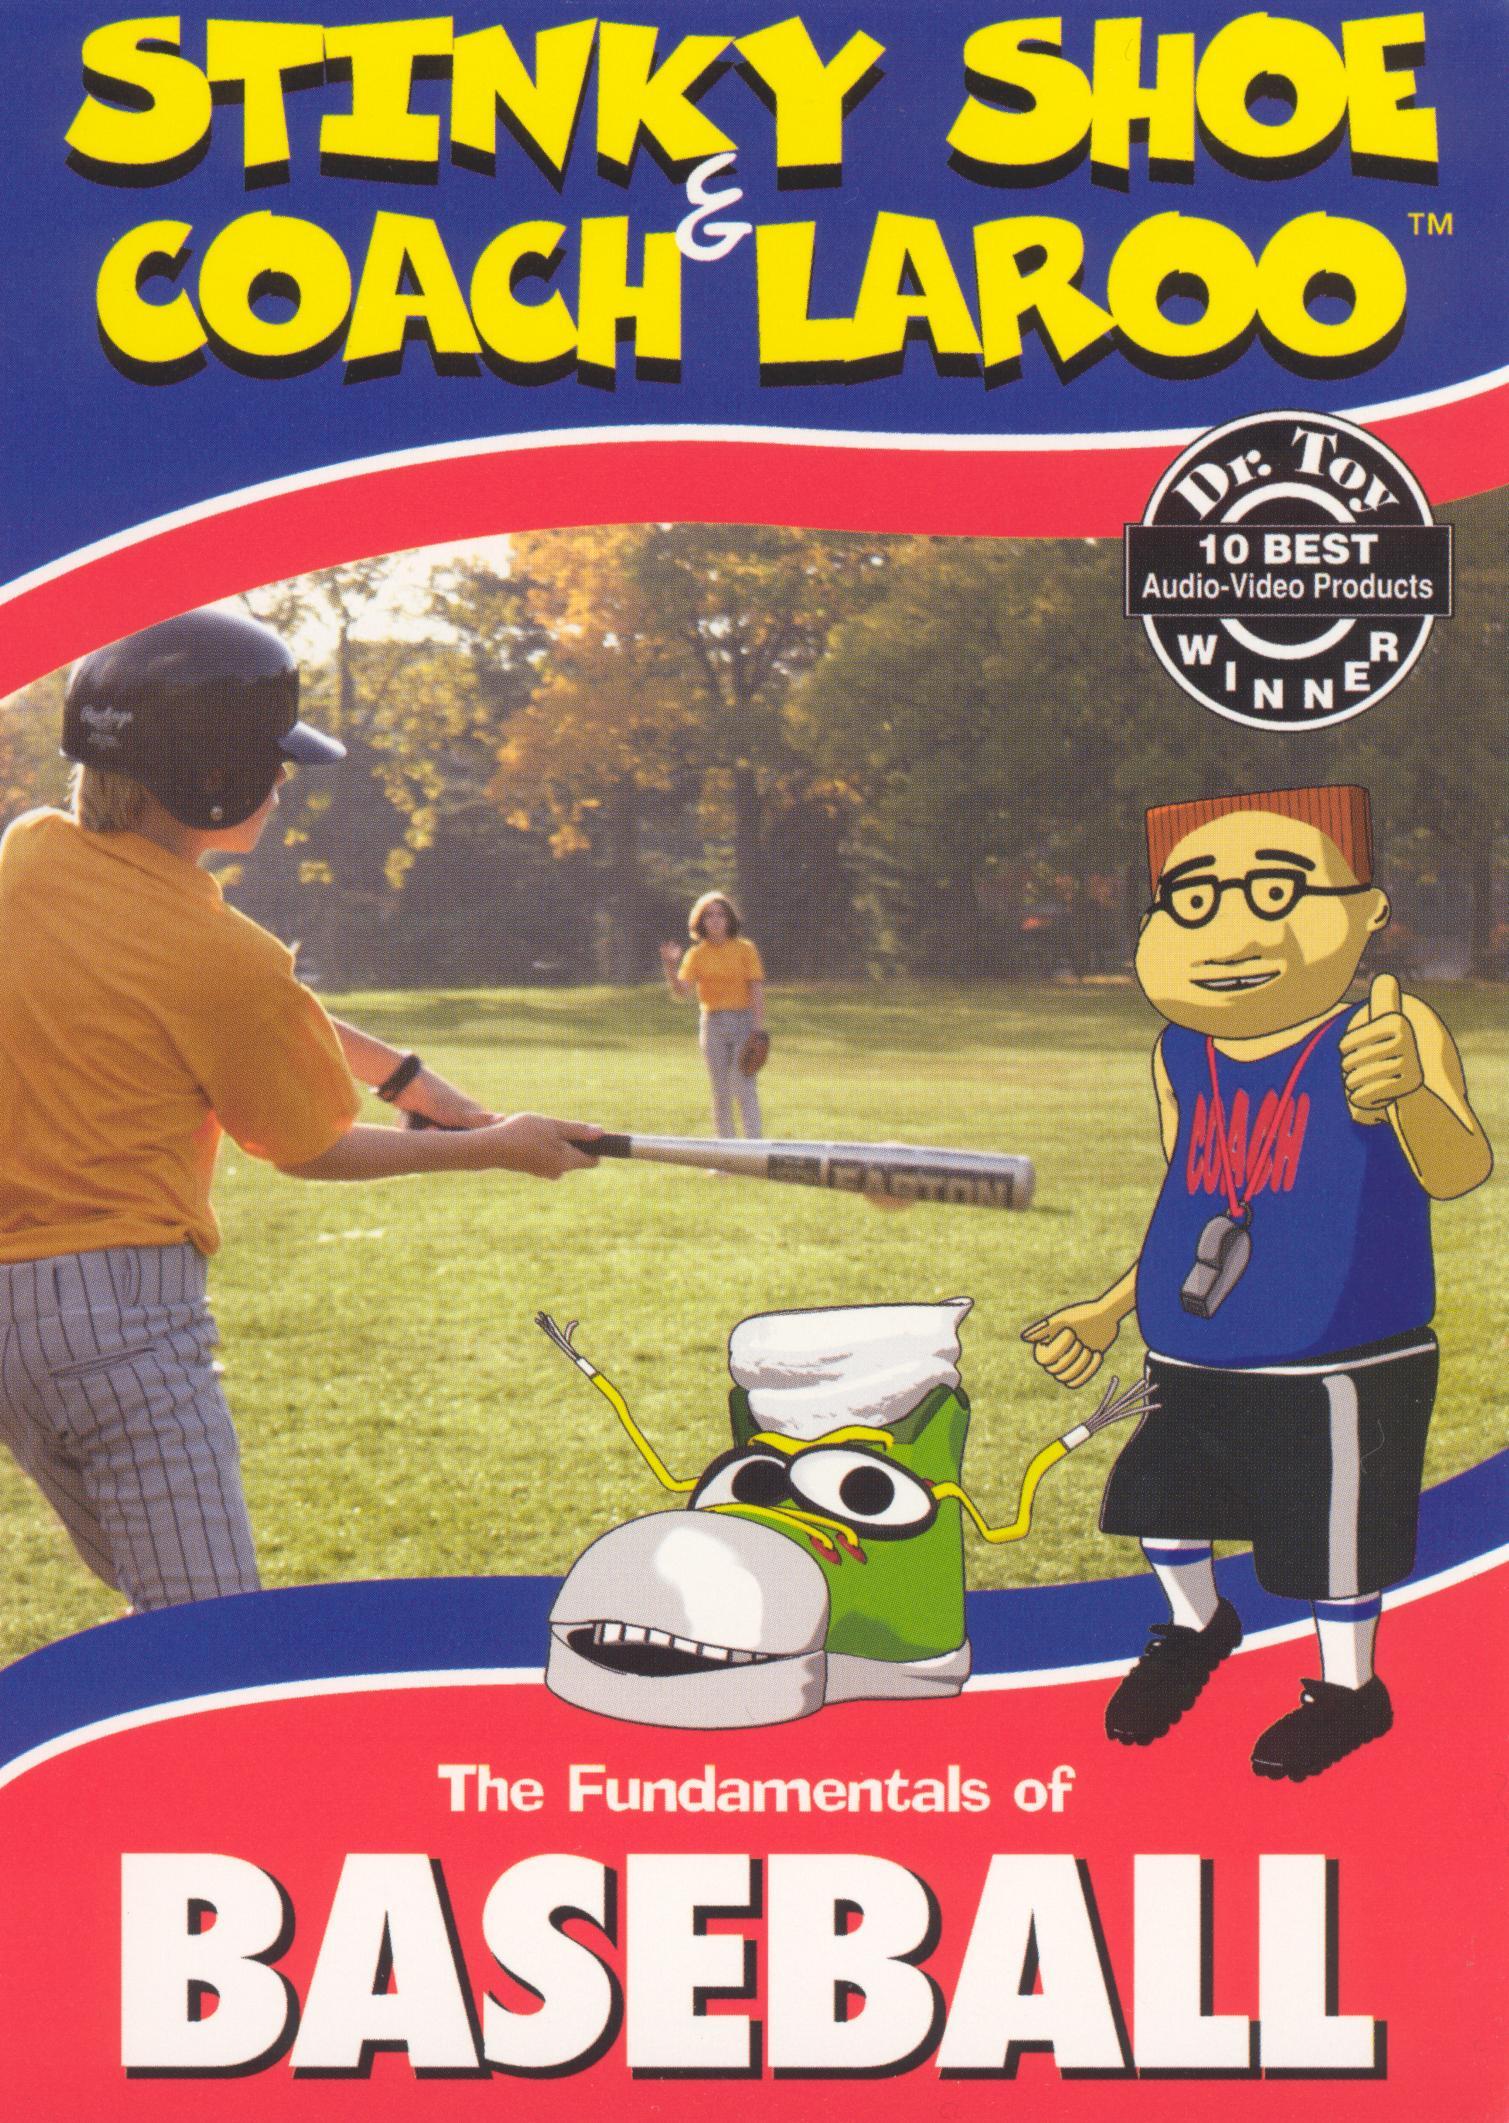 Stinky Shoe and Coach LaRoo: The Fundamentals of Baseball